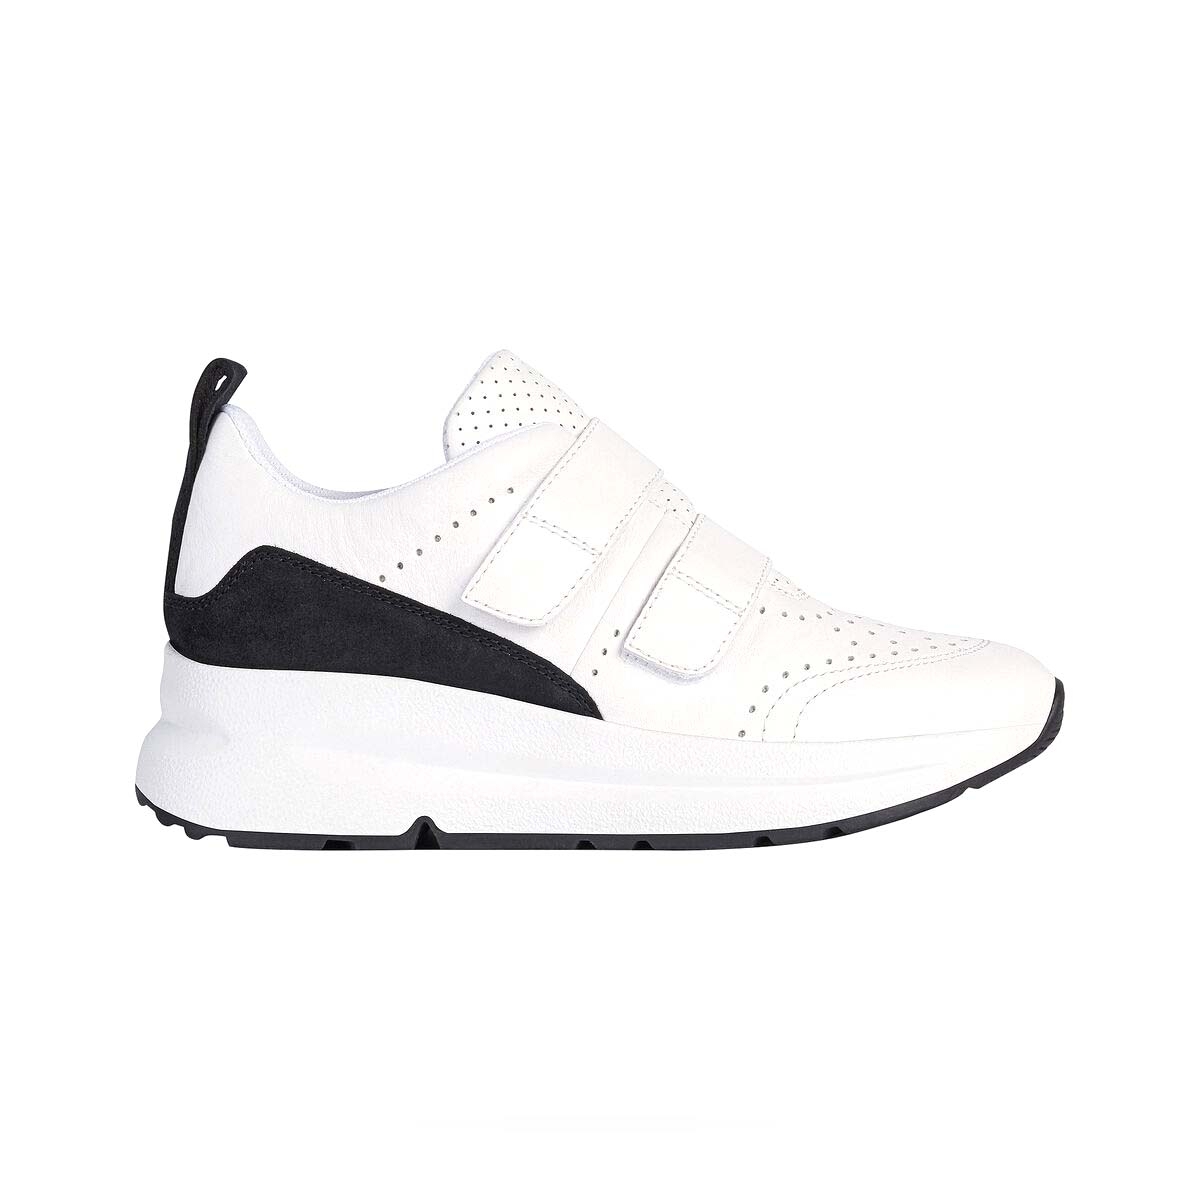 D Backsie sneaker